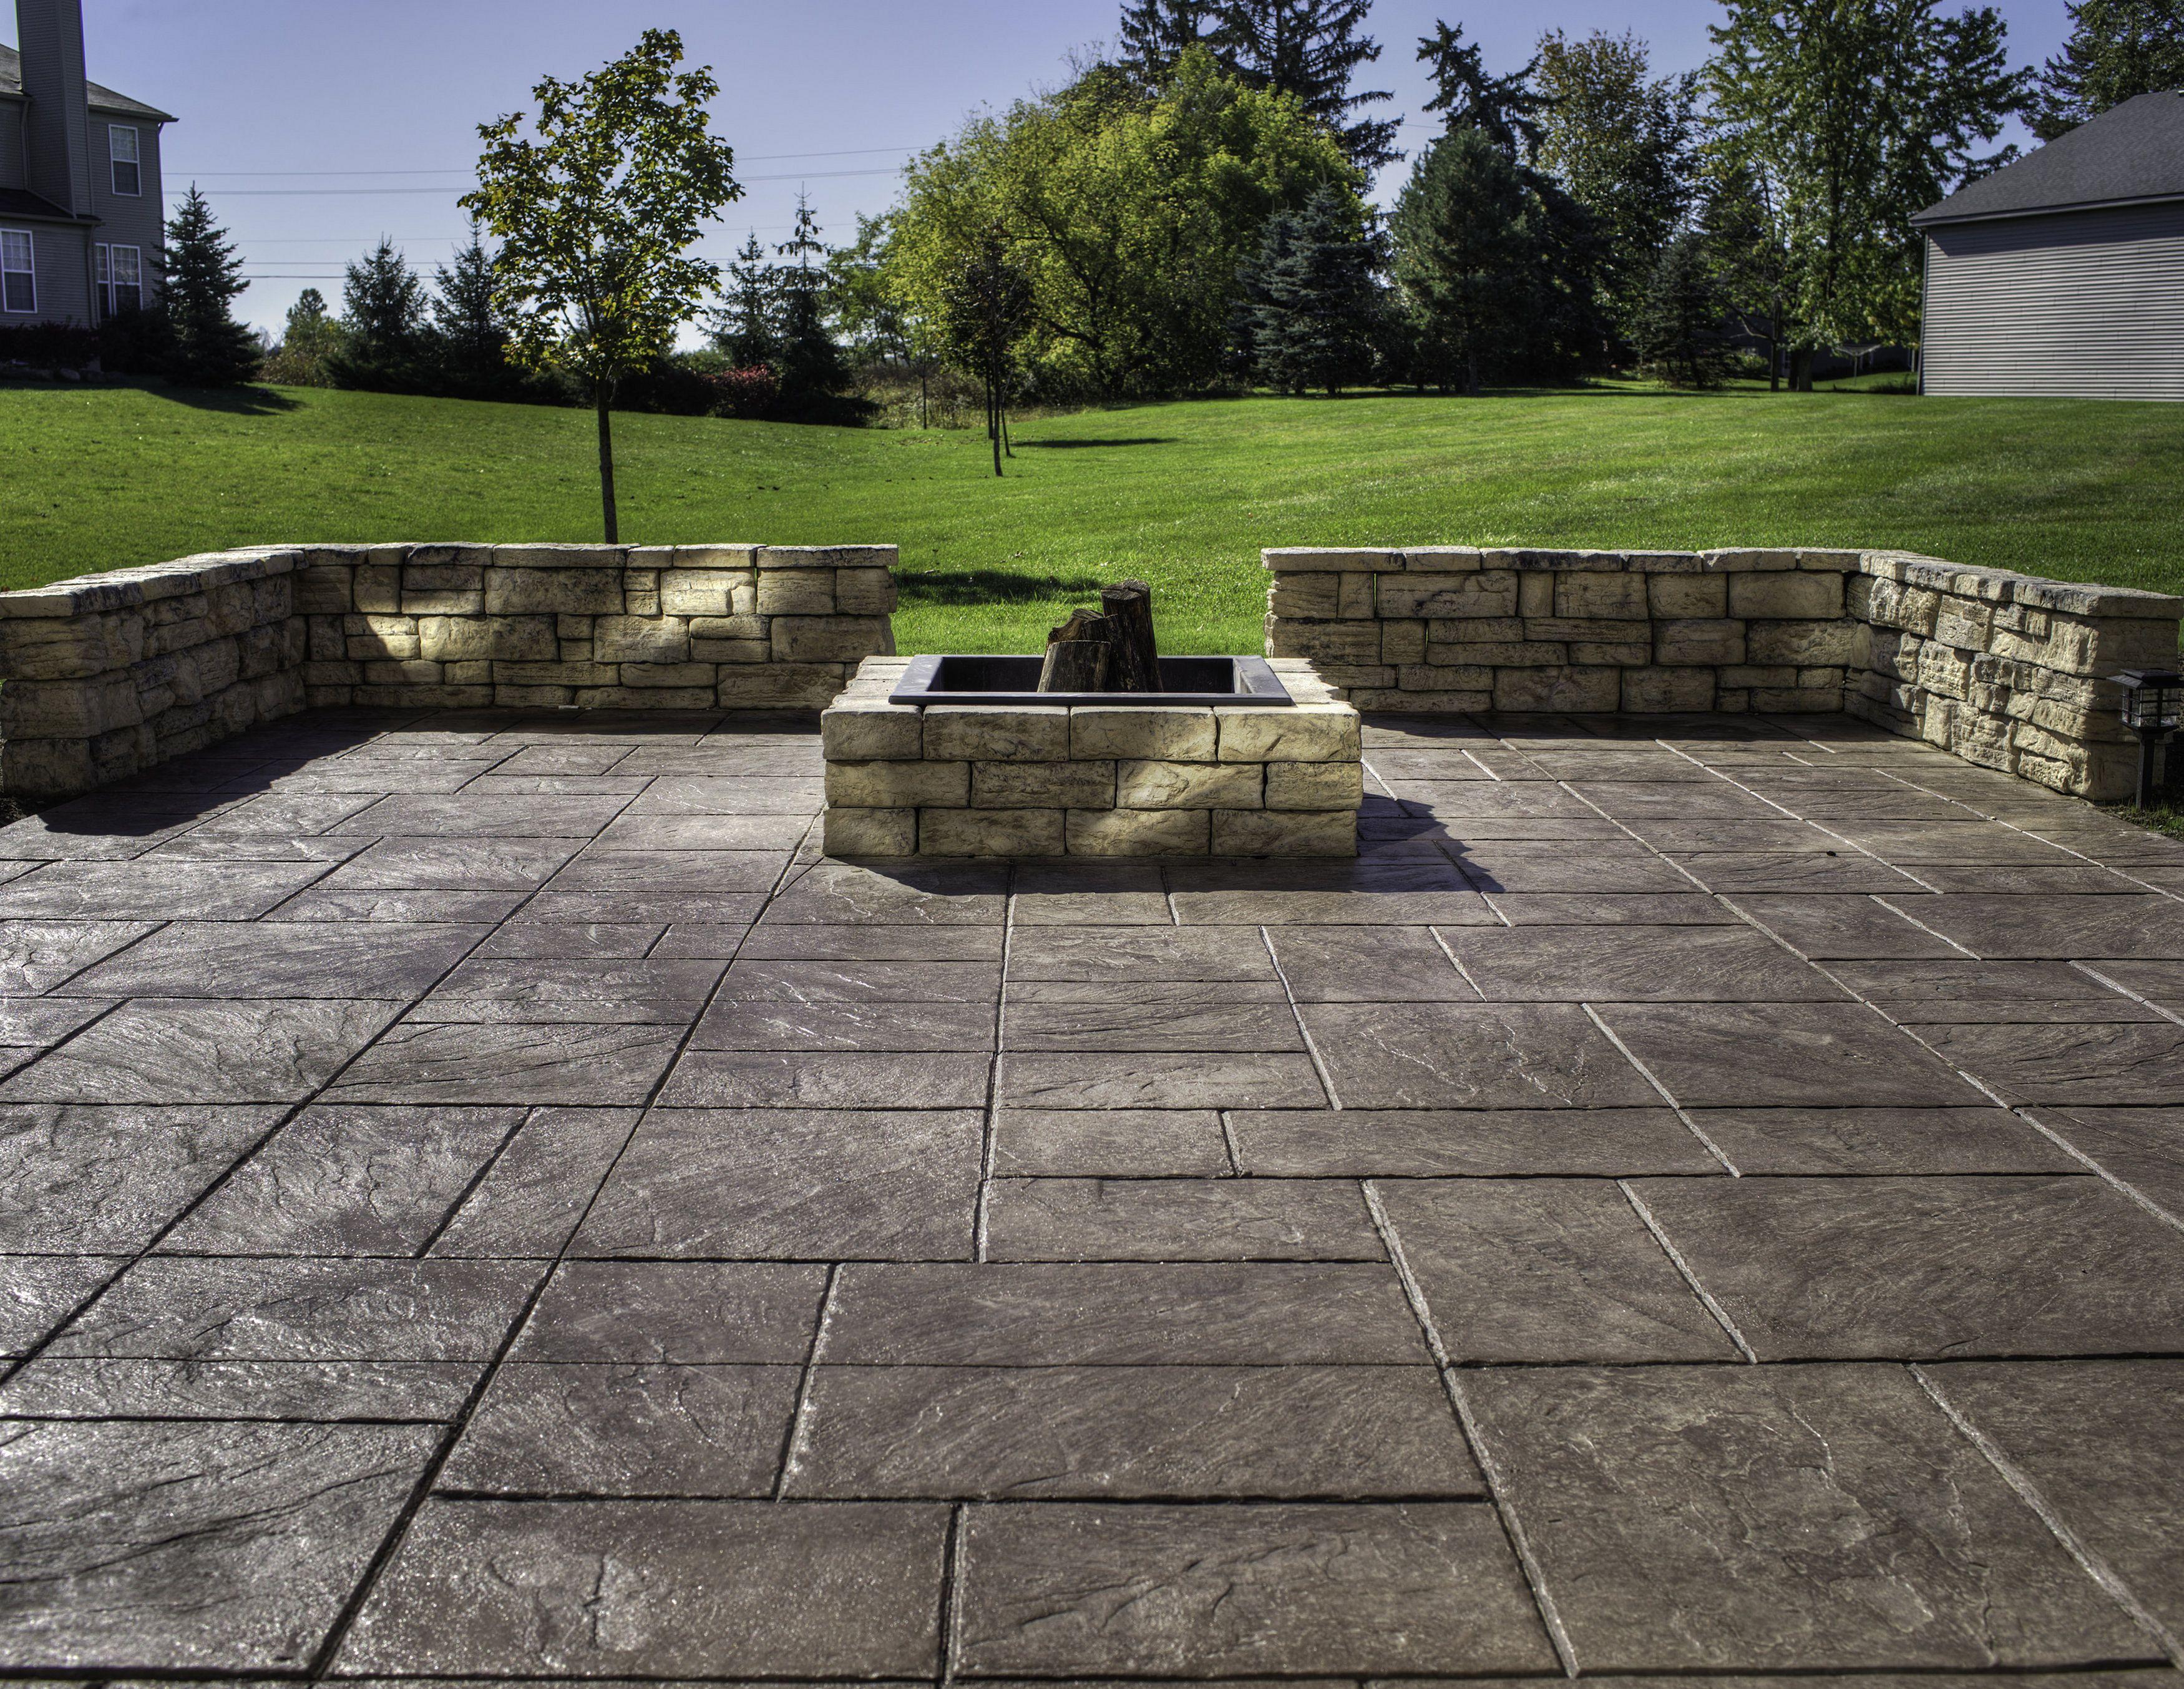 Epic Impressive 25 Stamped Concrete Patio For Inspiration For Your Home Https Freshouz Com Impressive Poured Concrete Patio Concrete Backyard Concrete Patio